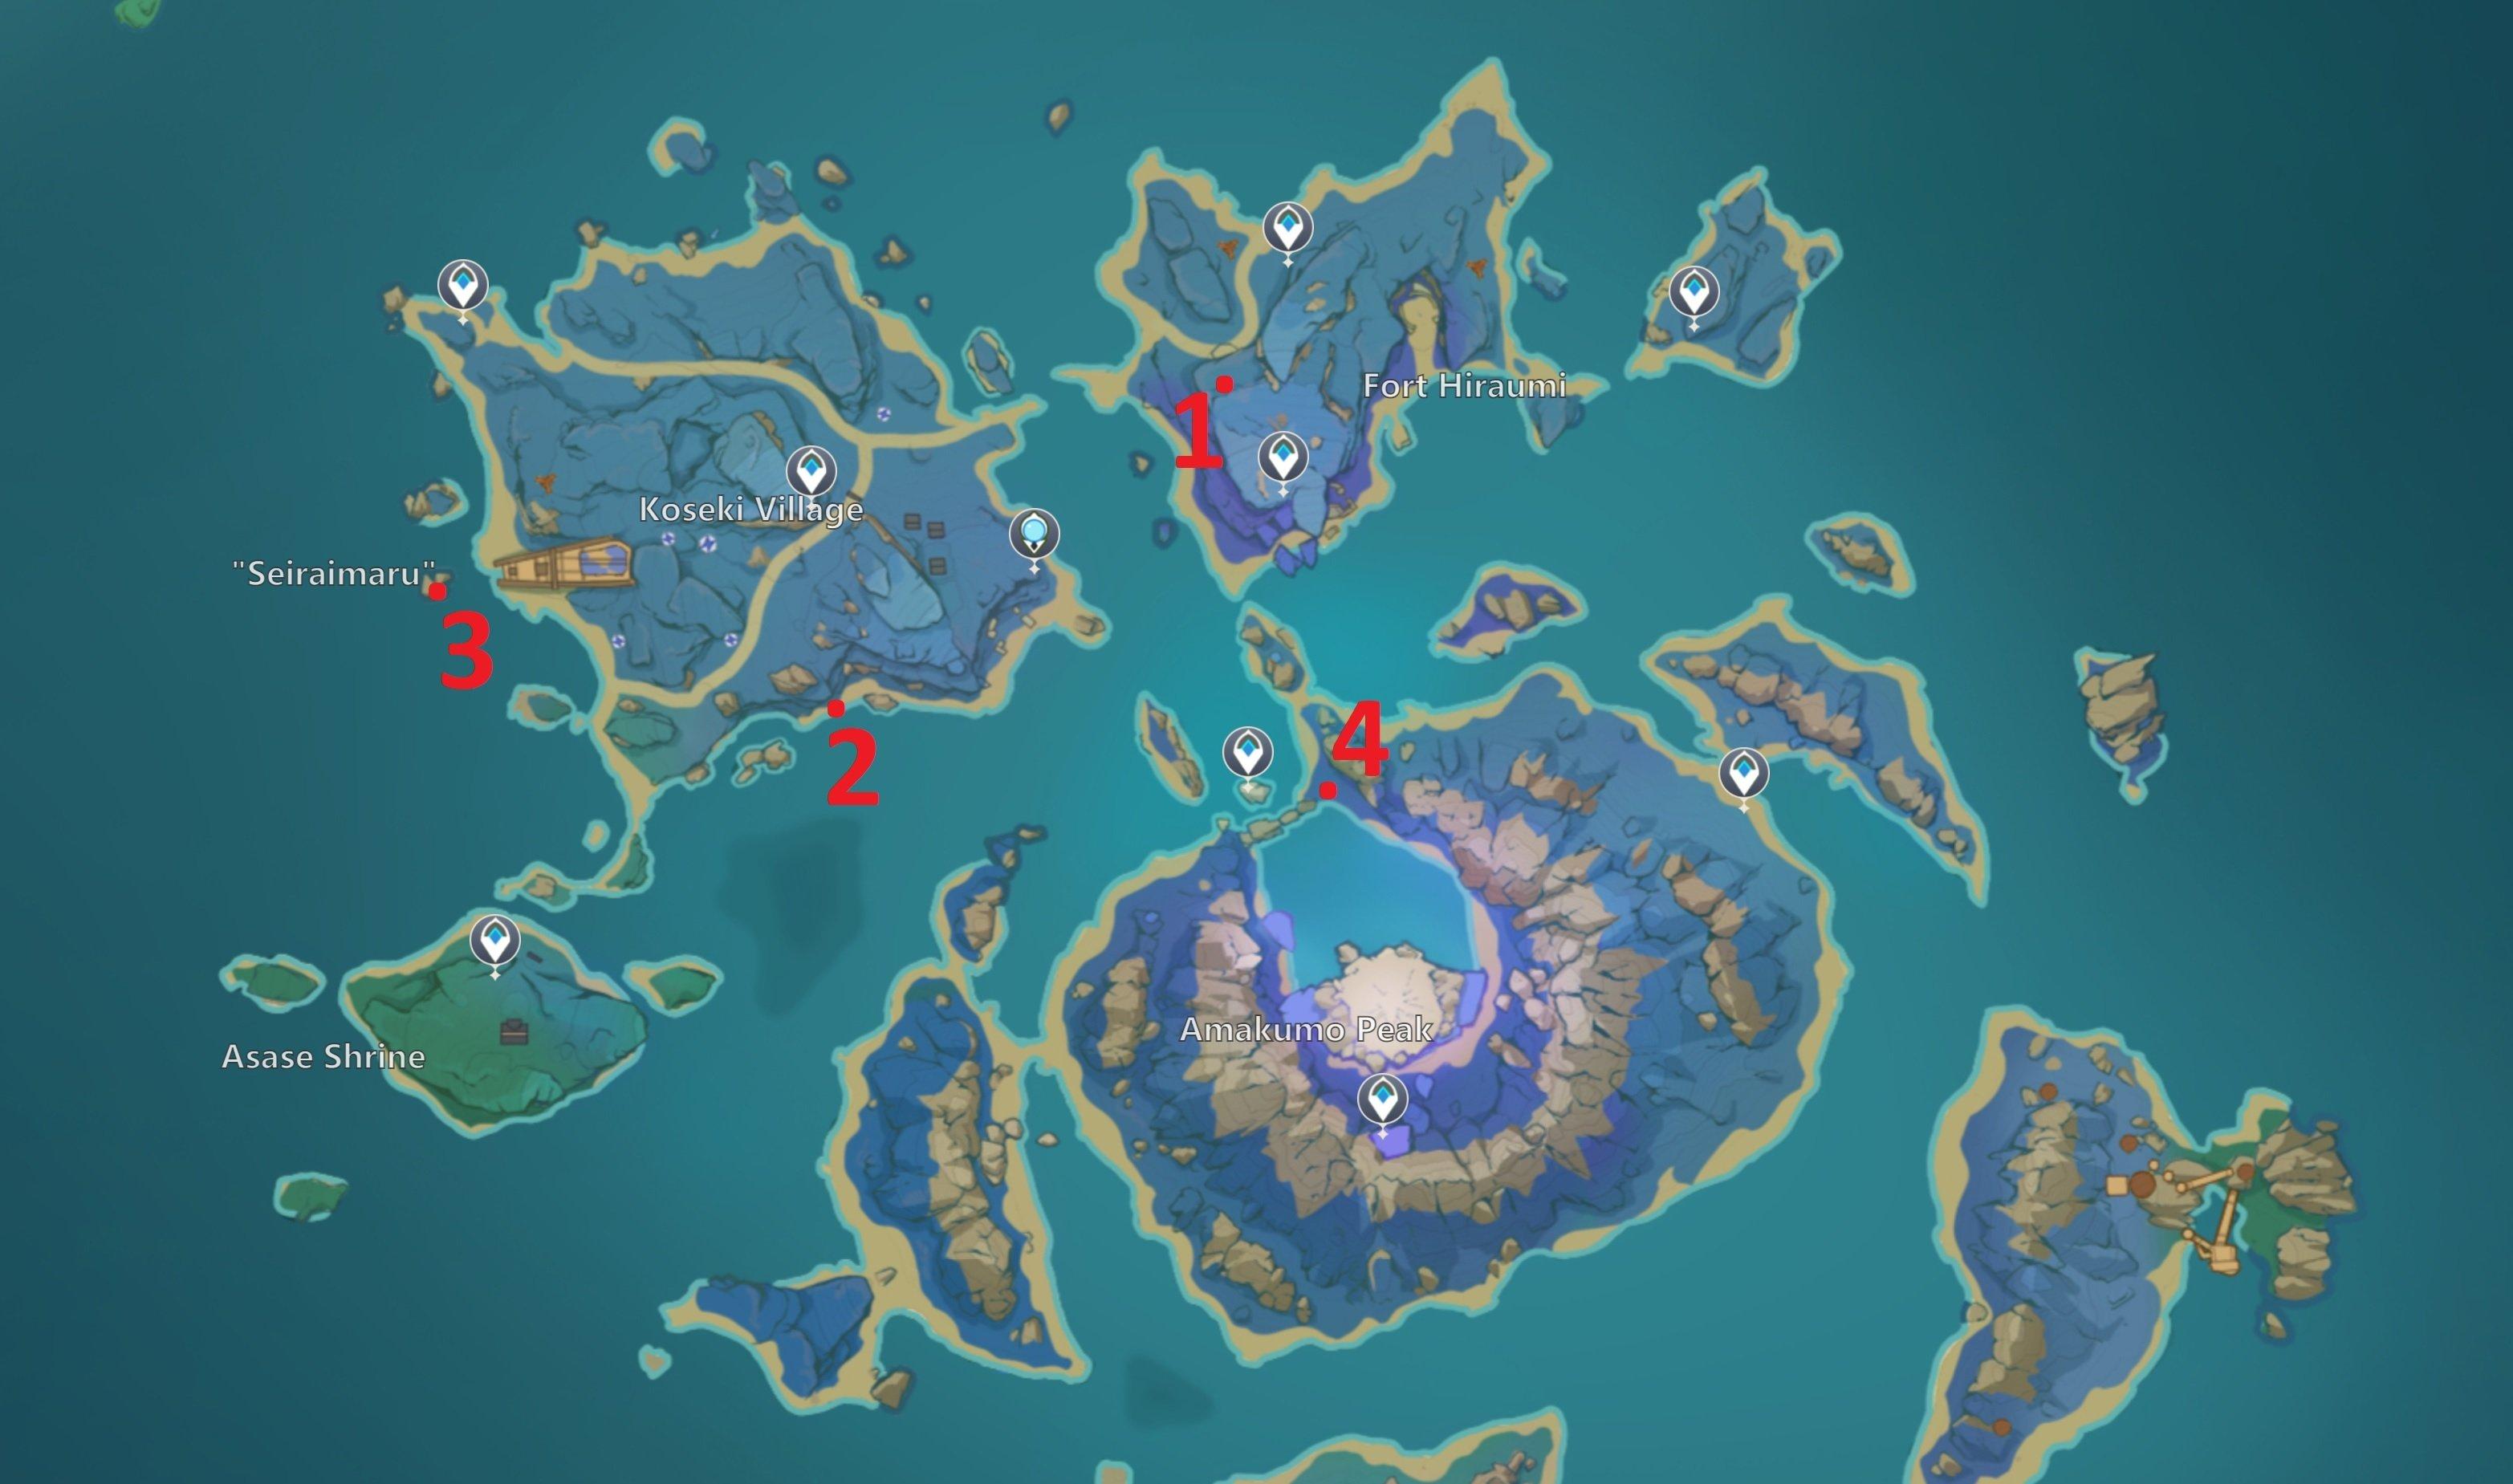 Genshin Impact Reminiscence of Seirai locations guide © miHoYo